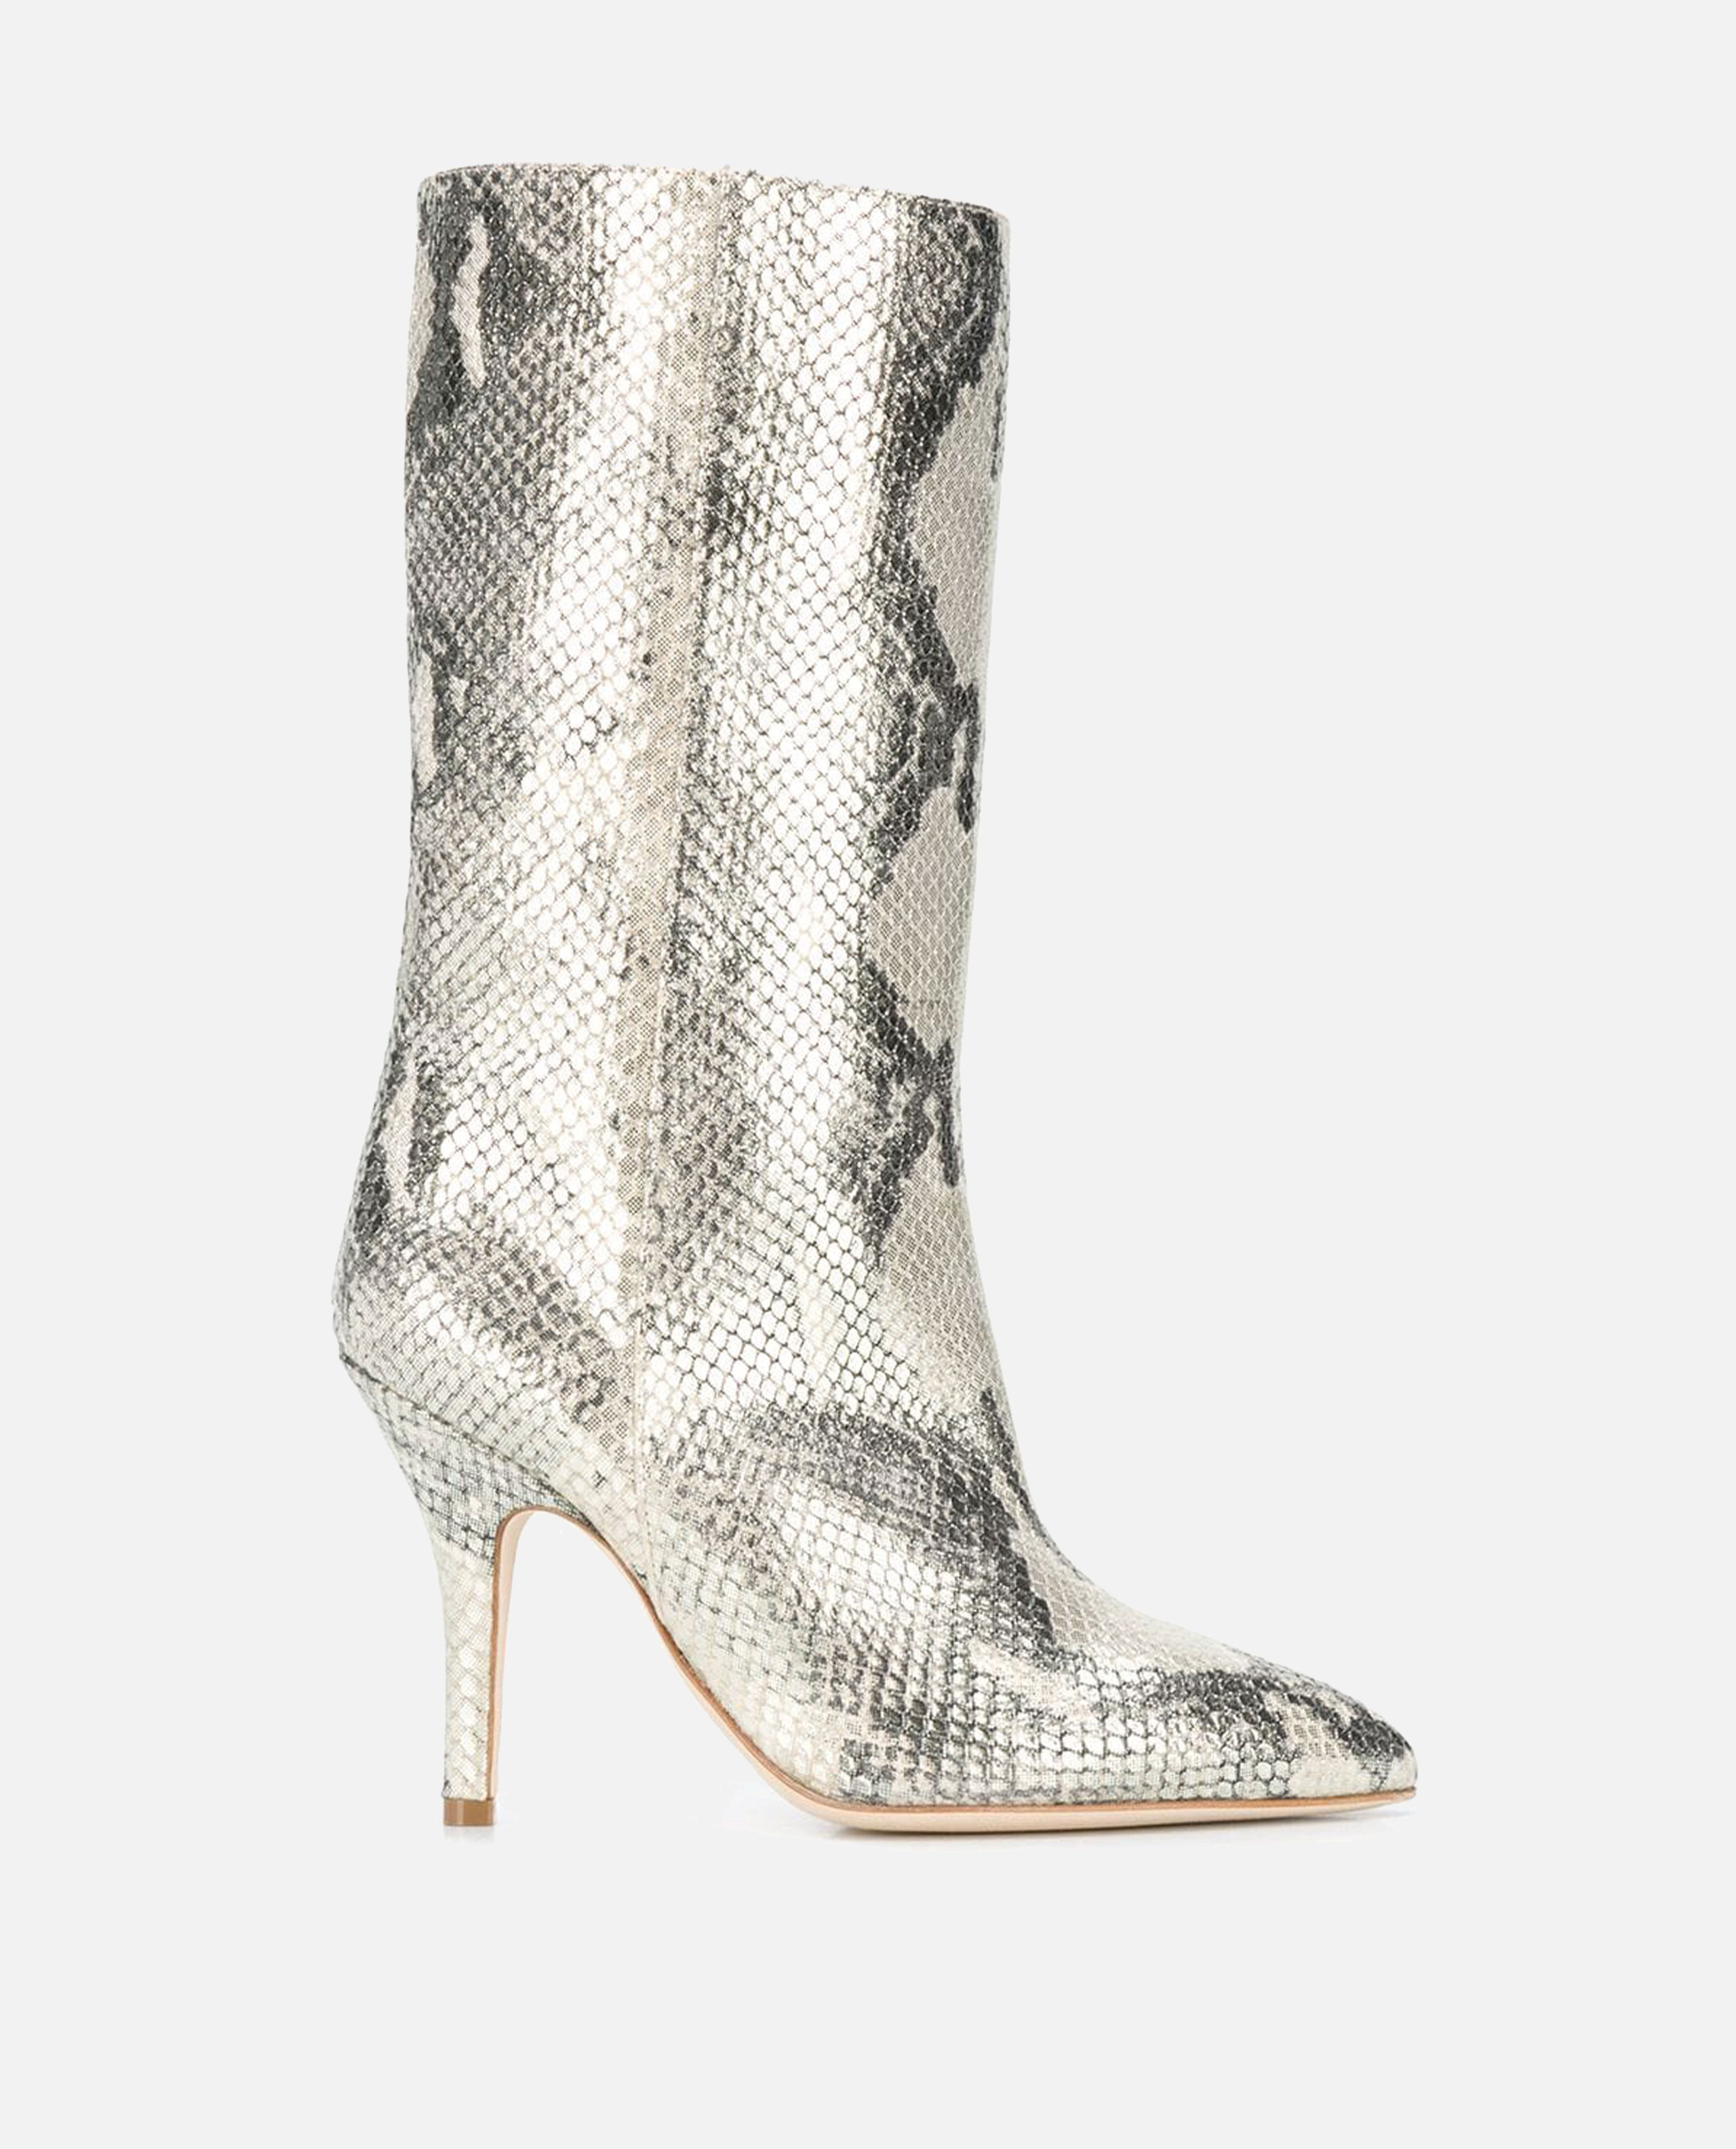 Paris Texas boots in python print